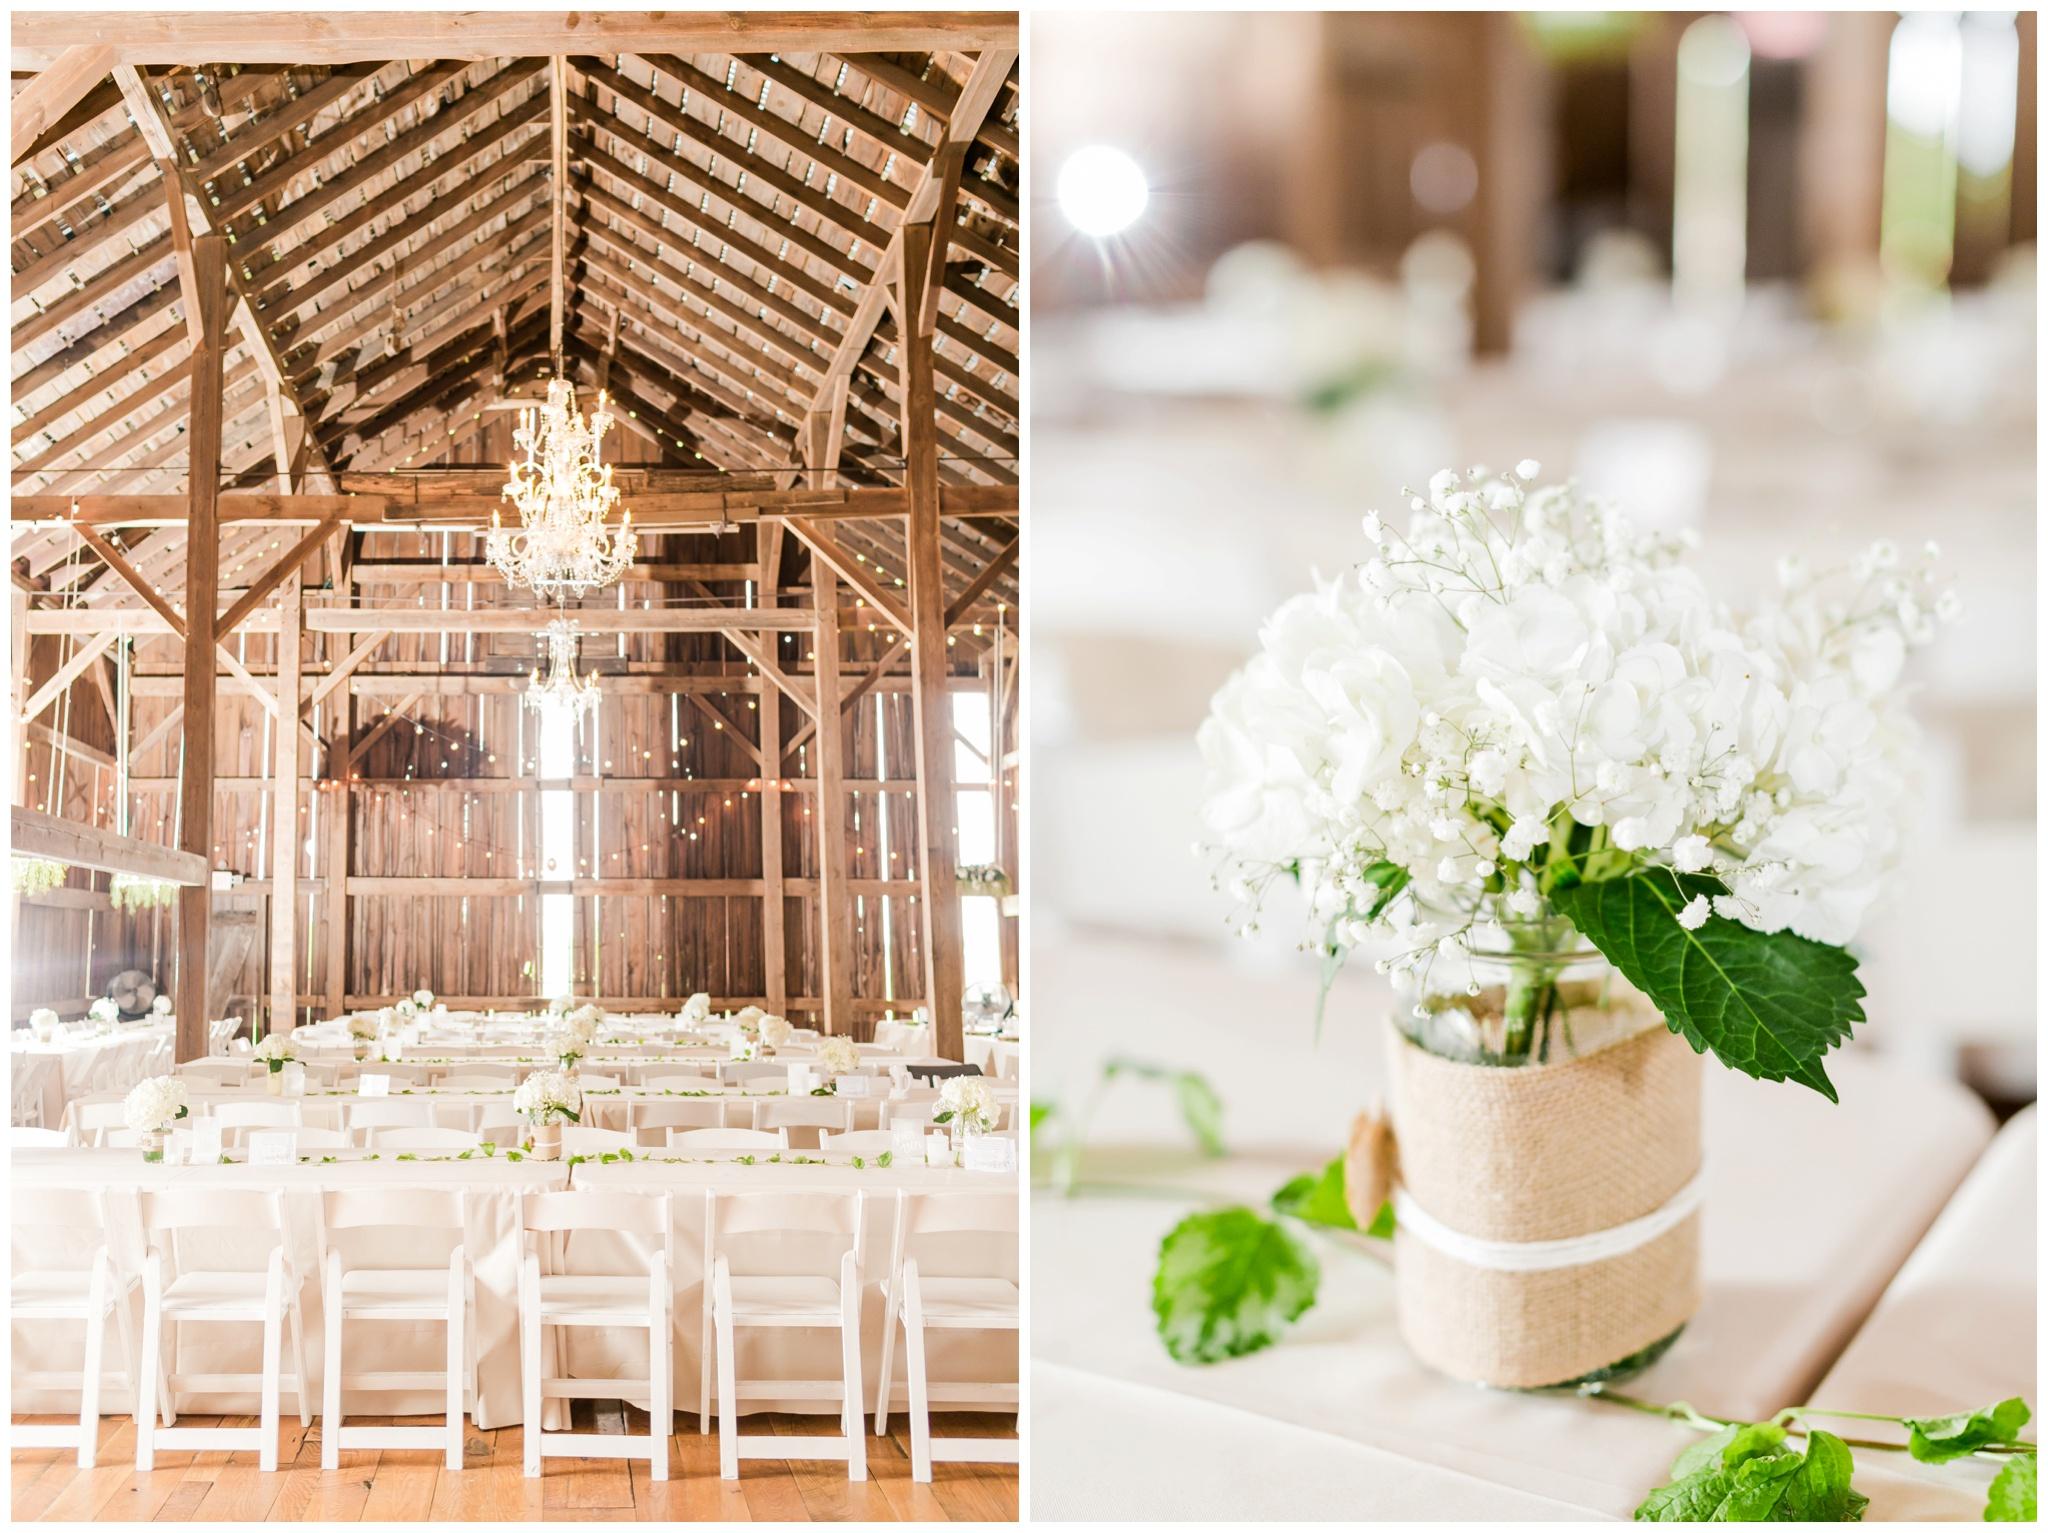 over_the_vines_wedding_edgerton_wisconsin_wedding_caynay_photo_4022.jpg